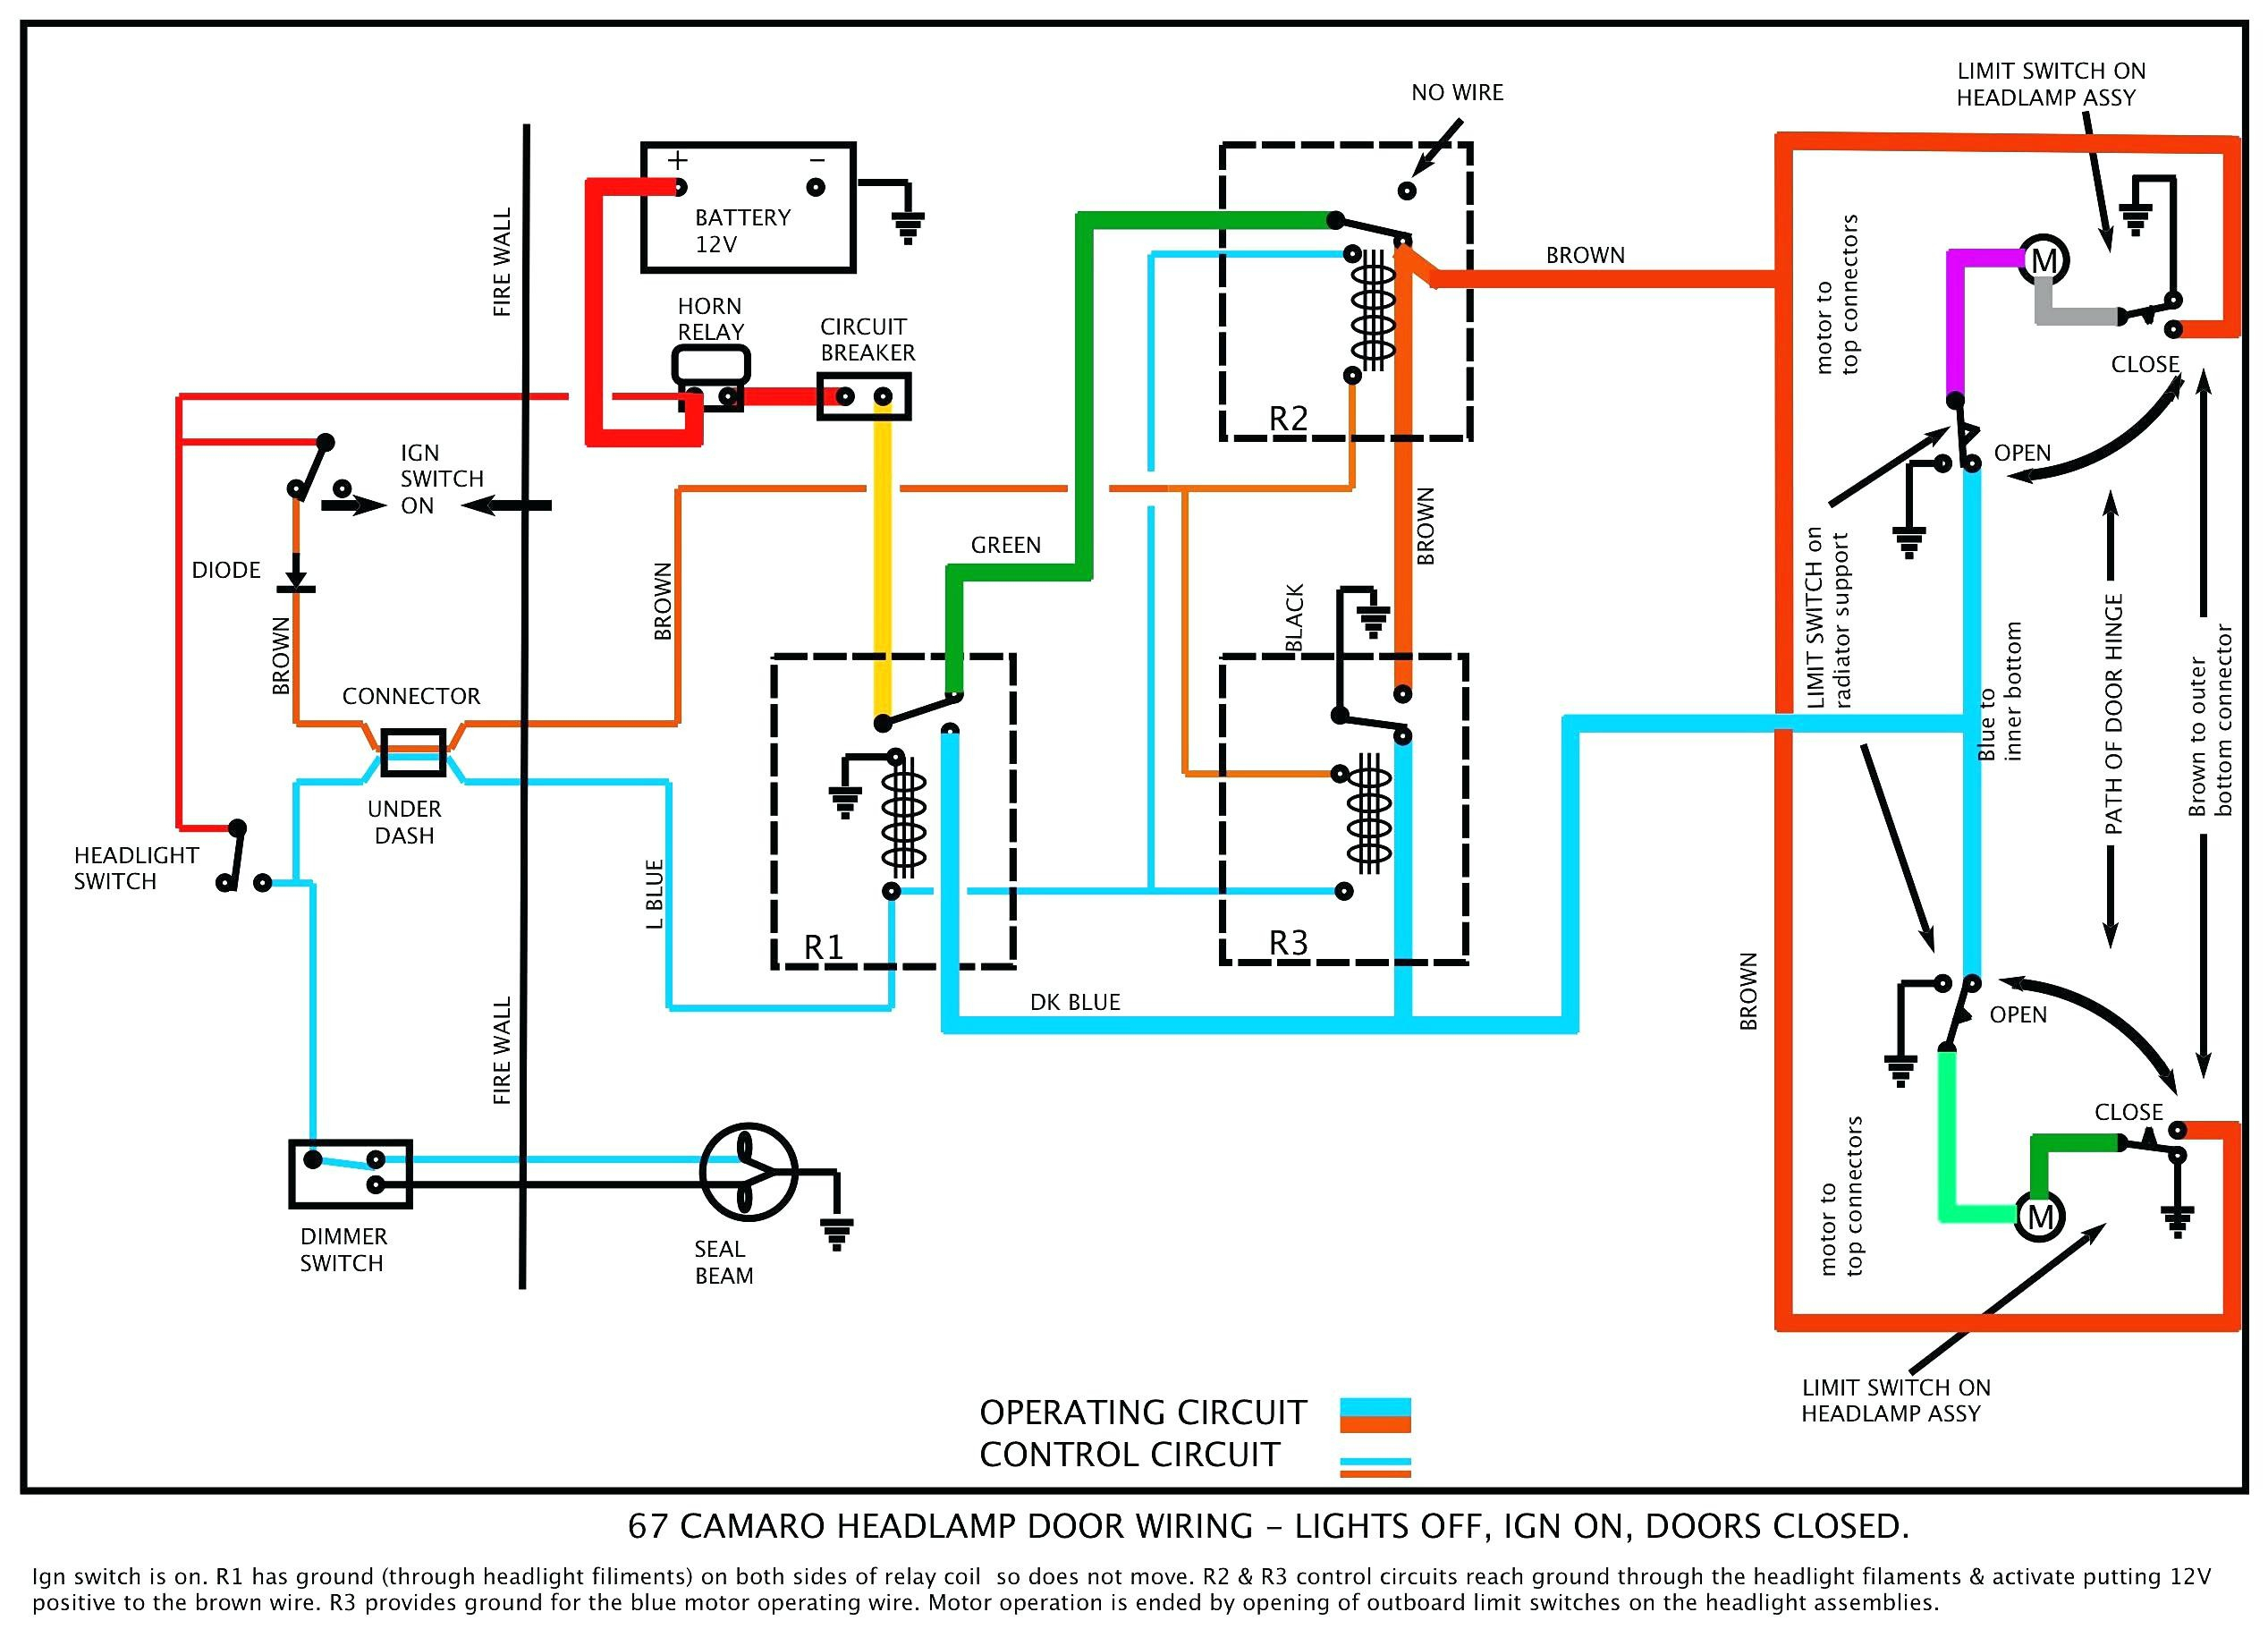 Genuine Bosch Horn Relay Wiring Diagram 11962 In | Philteg.in - Bosch Relay Wiring Diagram